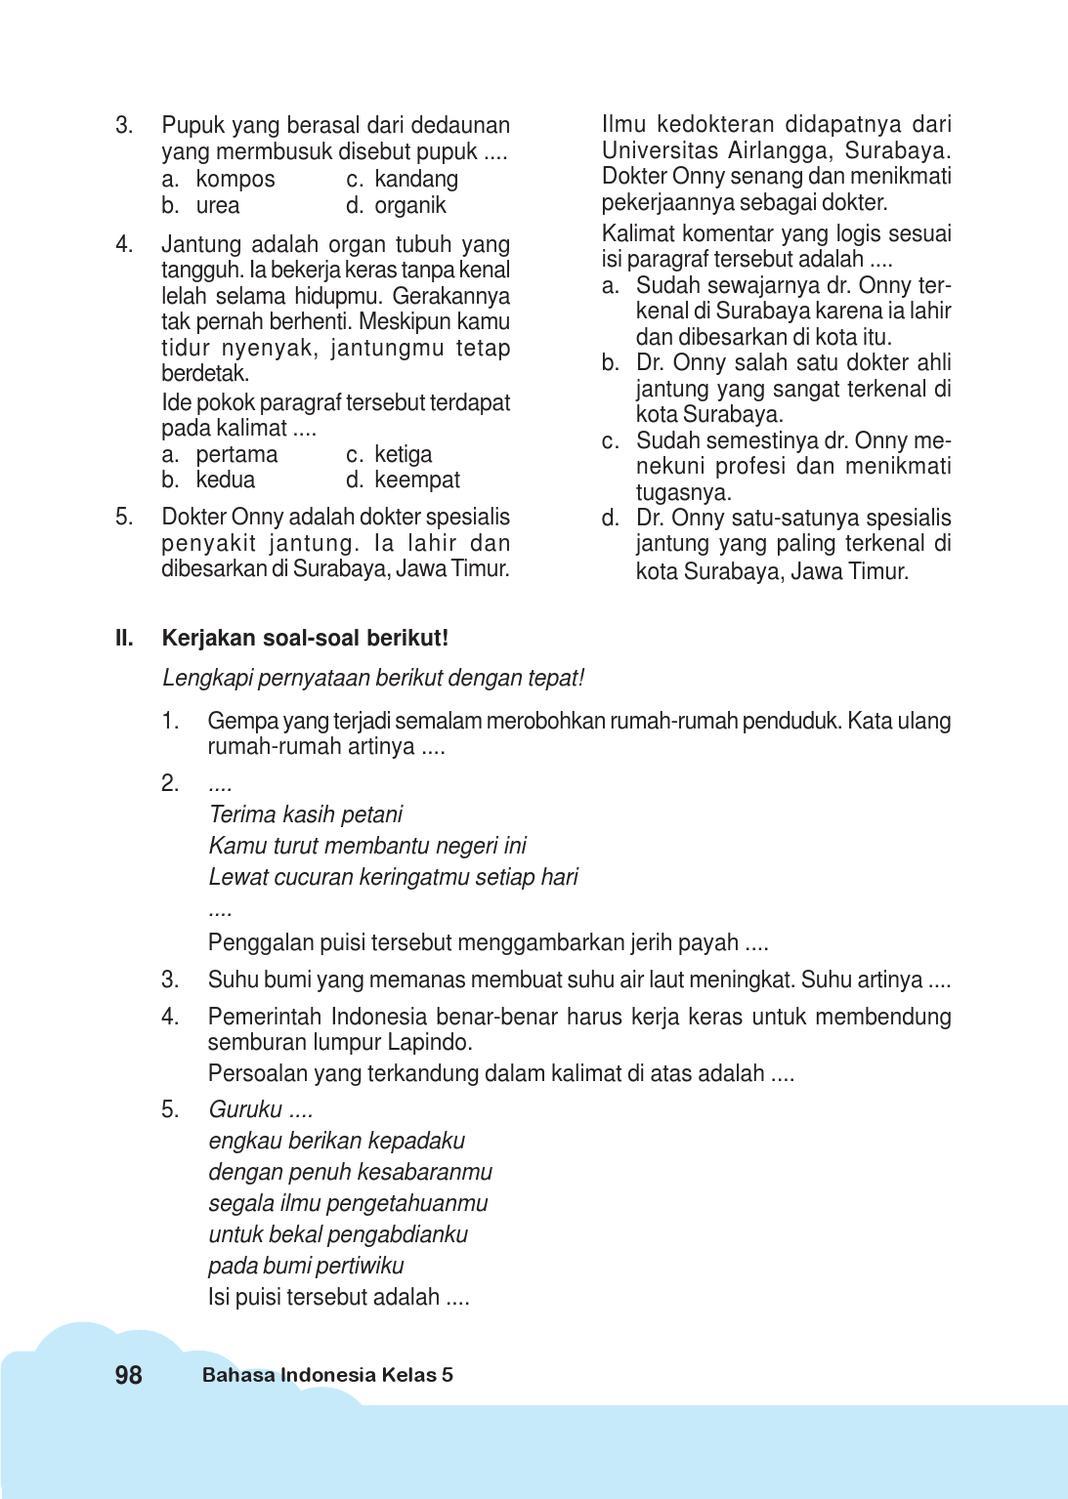 Ide Pokok Paragraf Tersebut : pokok, paragraf, tersebut, Kelas, Bahasa, Indonesia, Iskandar, Herawati, Issuu